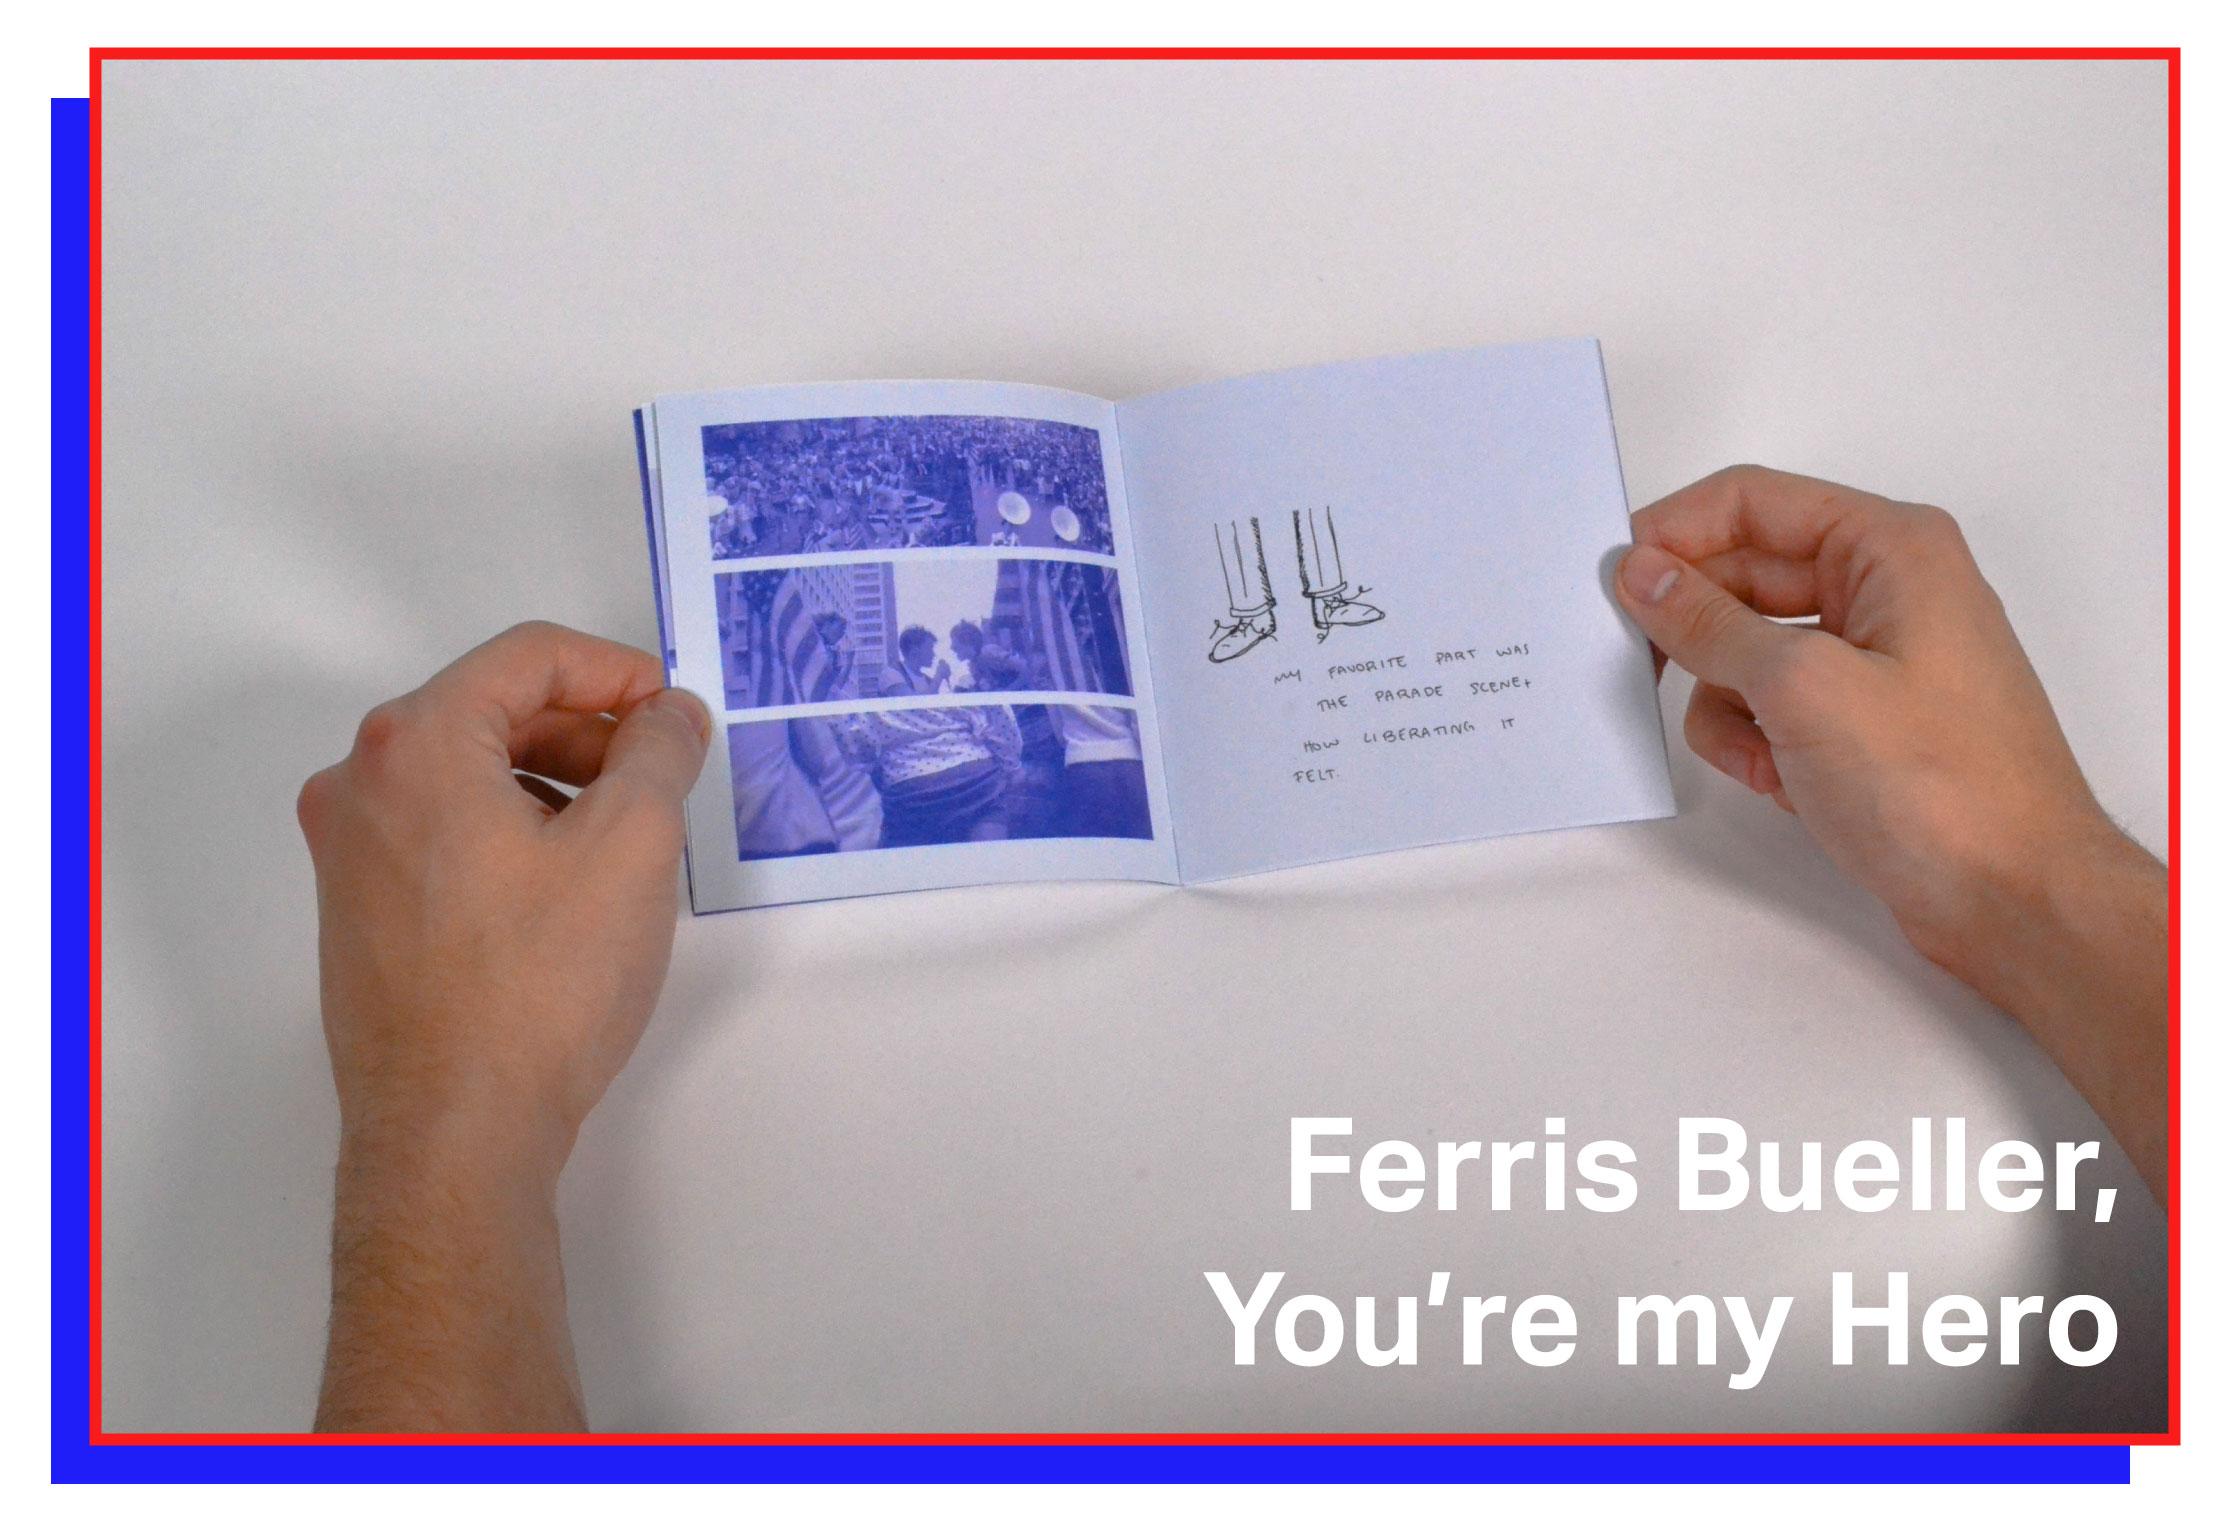 Ferris Bueller, You're my Hero